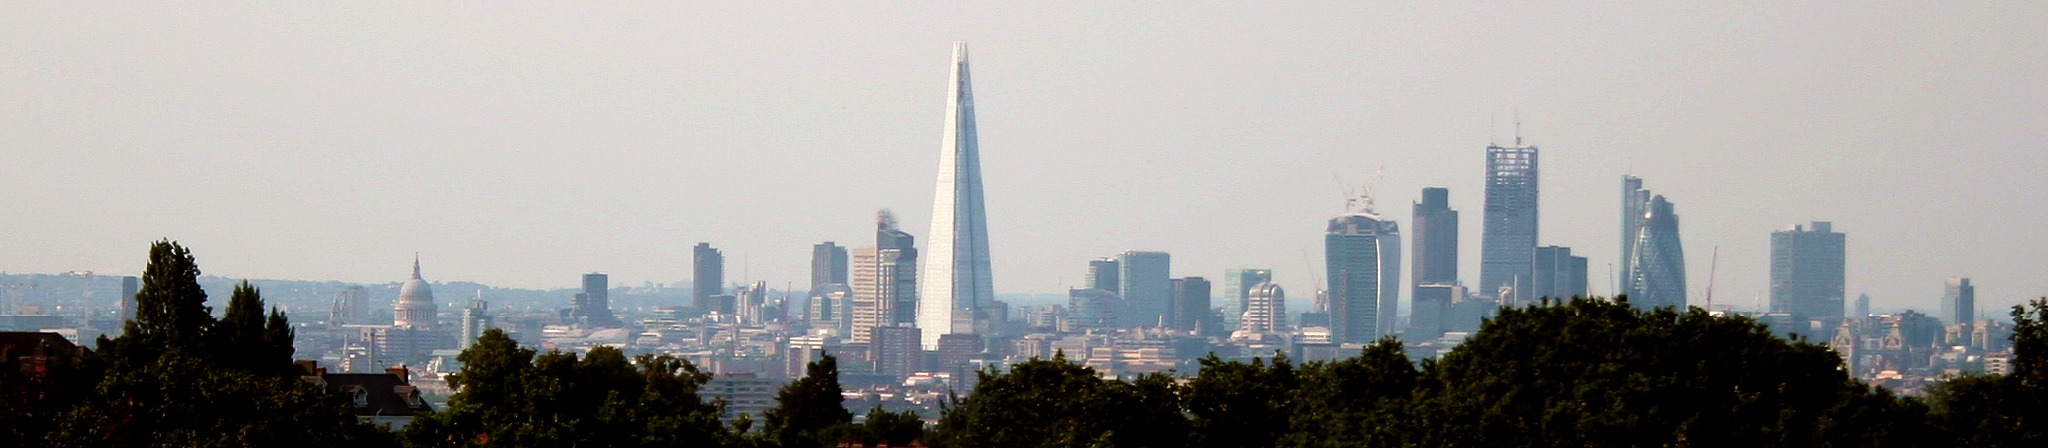 Die Londoner Skyline (Bild: Cmglee)